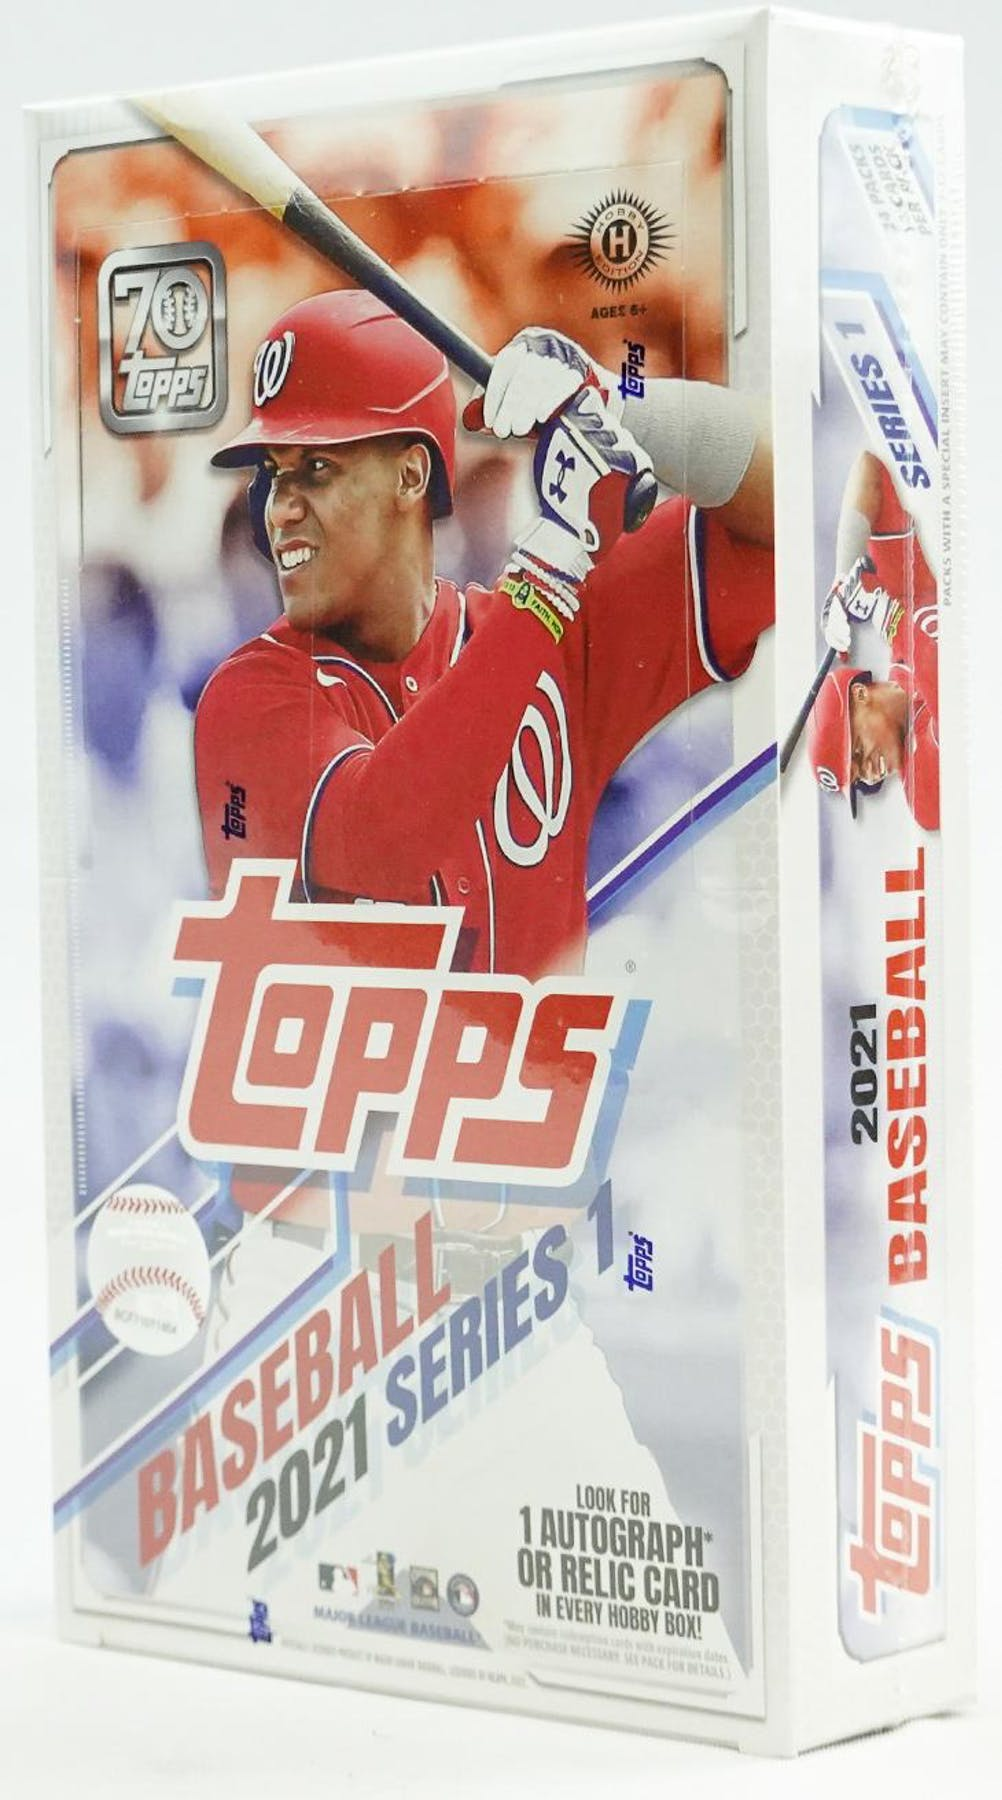 20 Topps Series 20 Baseball Hobby Box   DA Card World